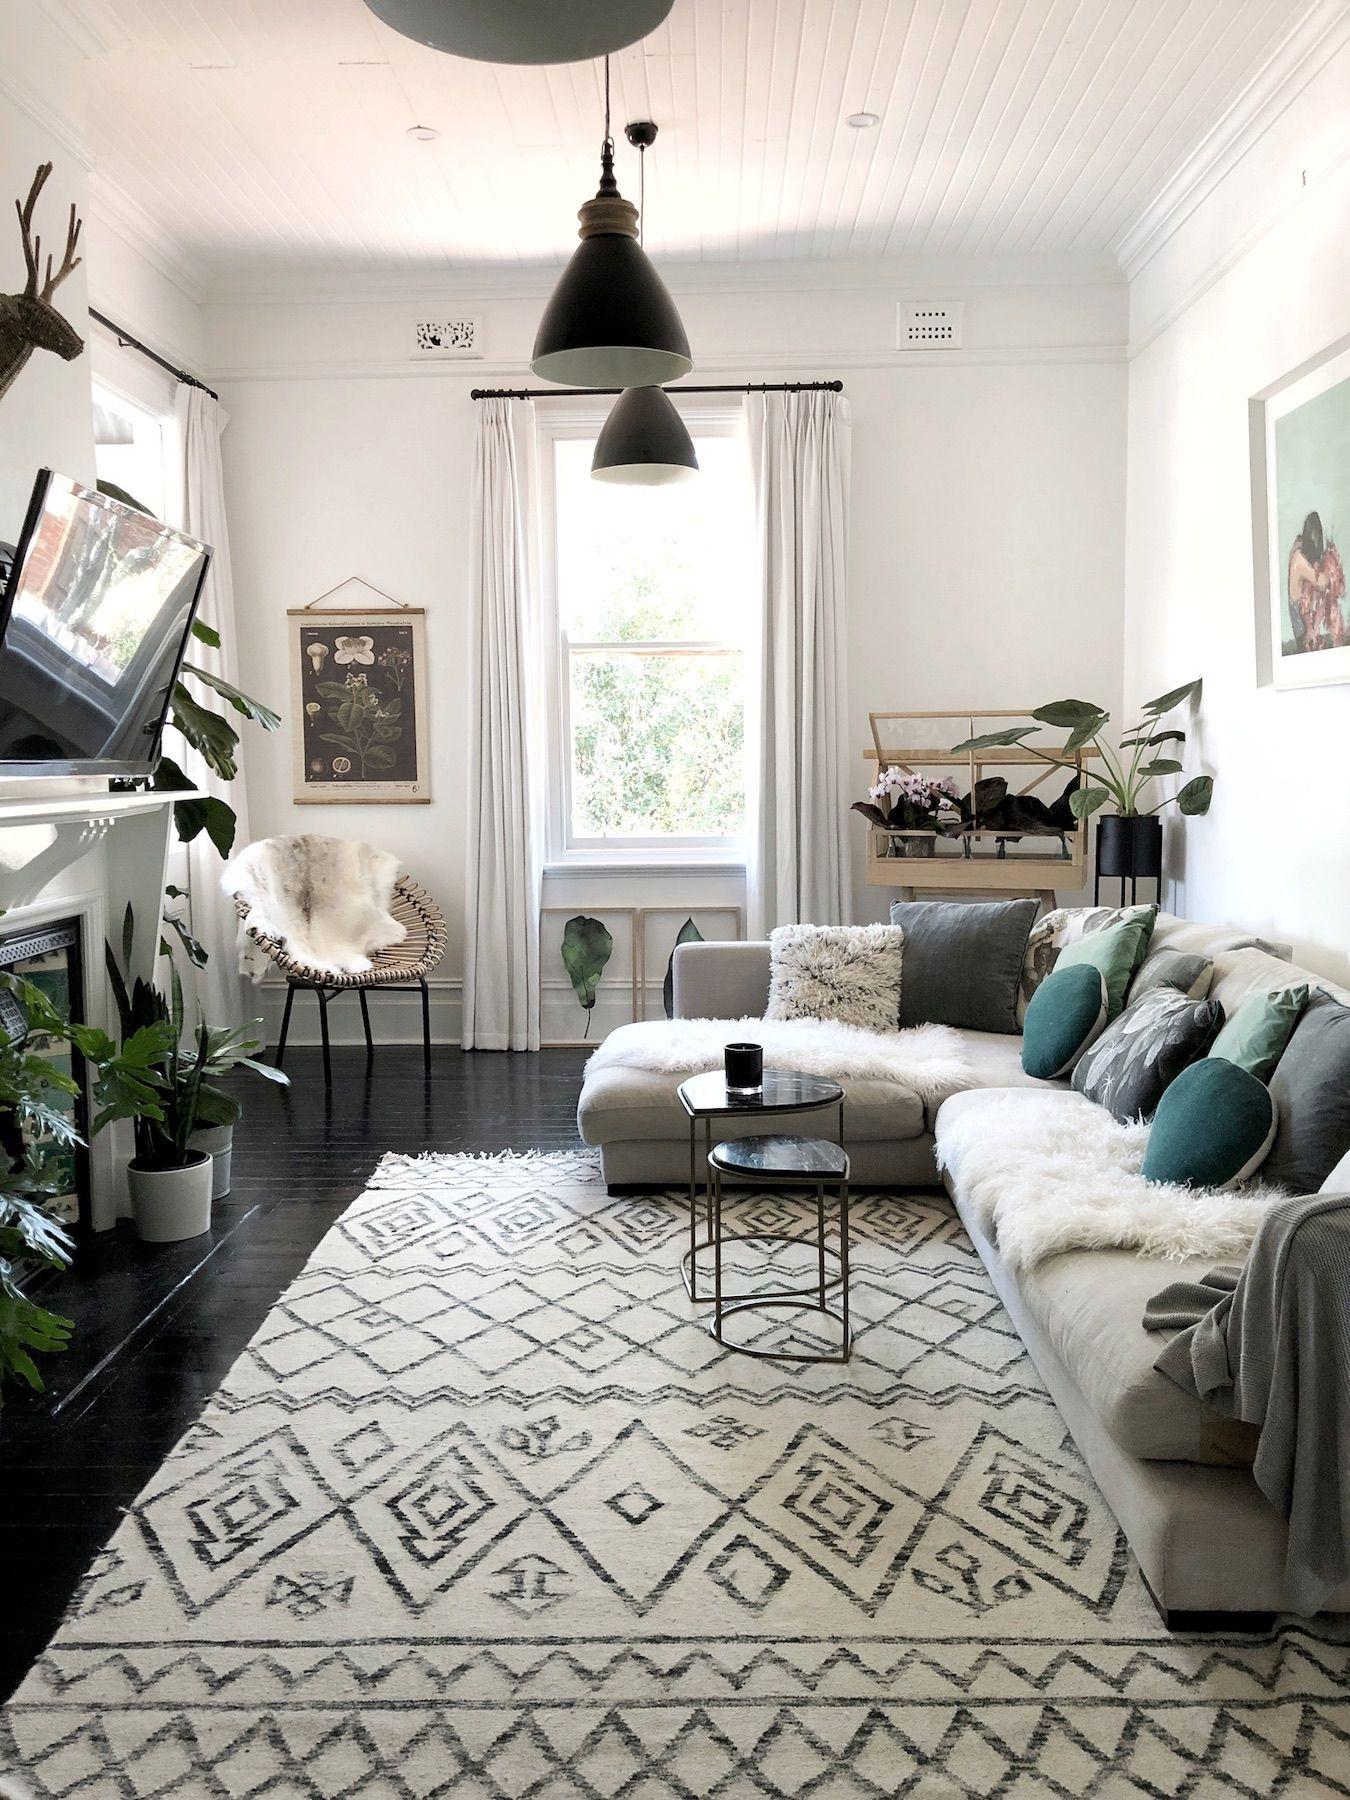 In Australia A Florist Family Room Design Living Room On A Budget Bedroom Decor